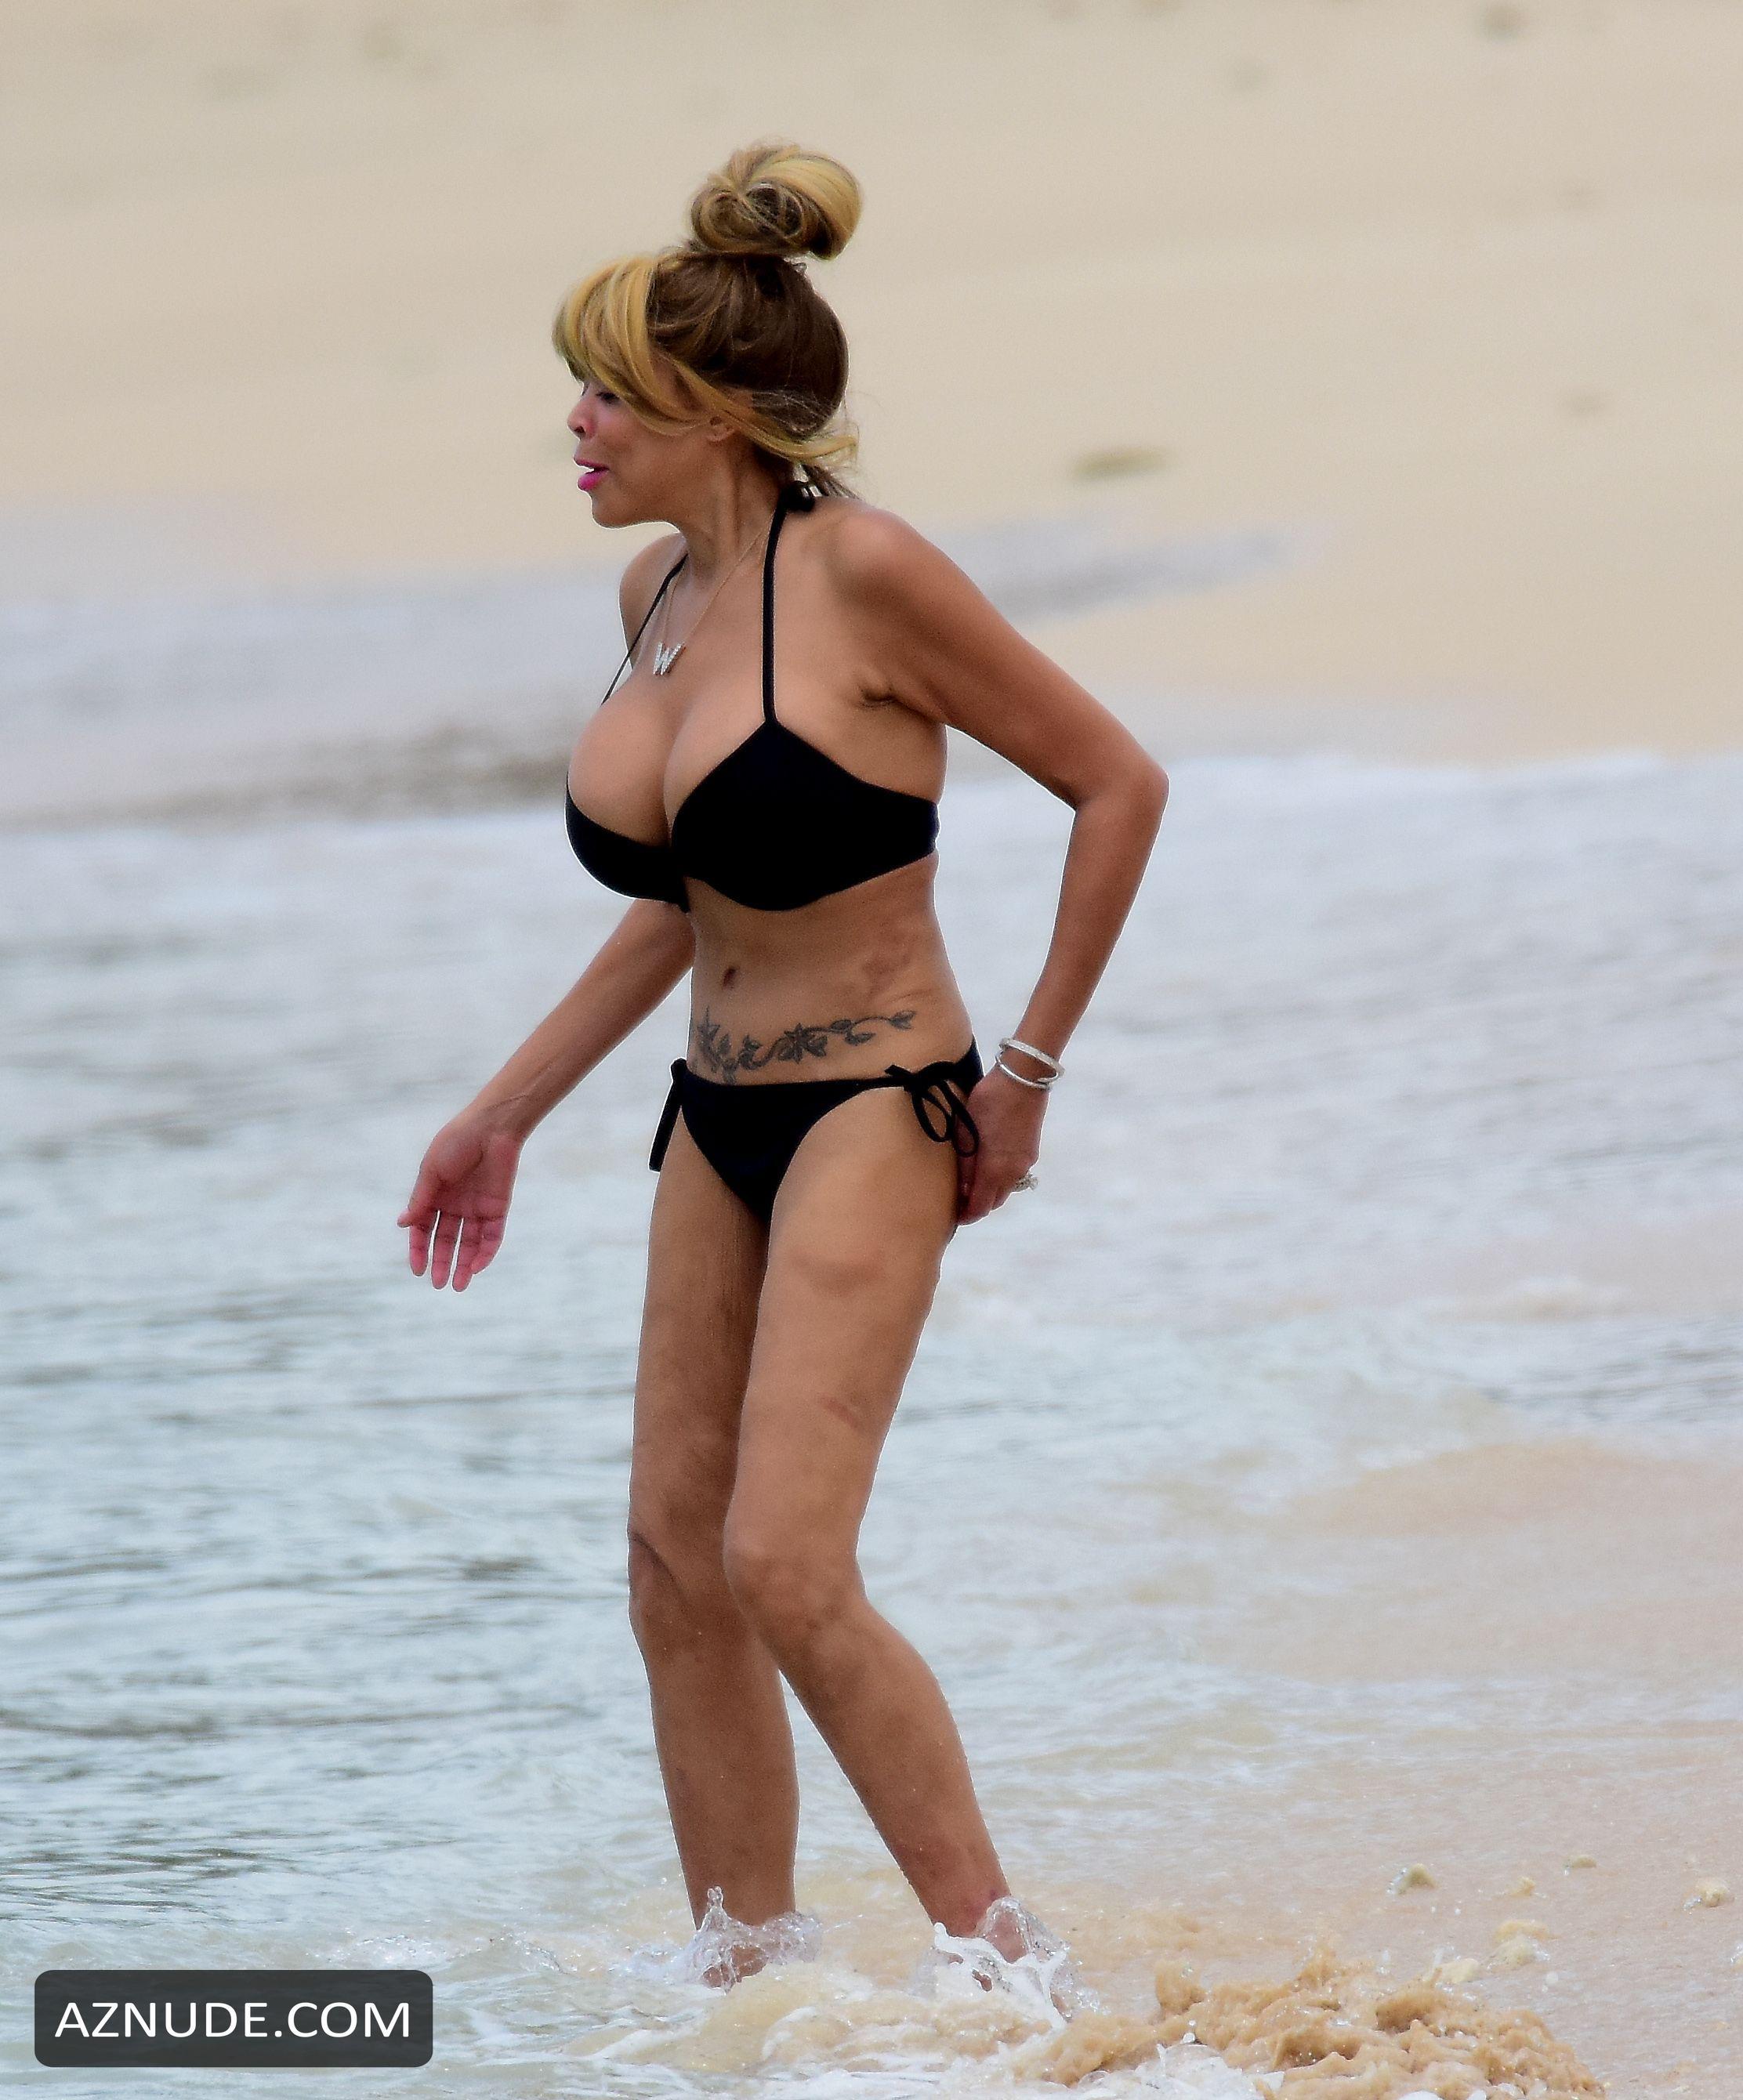 Wendy o. williams naked